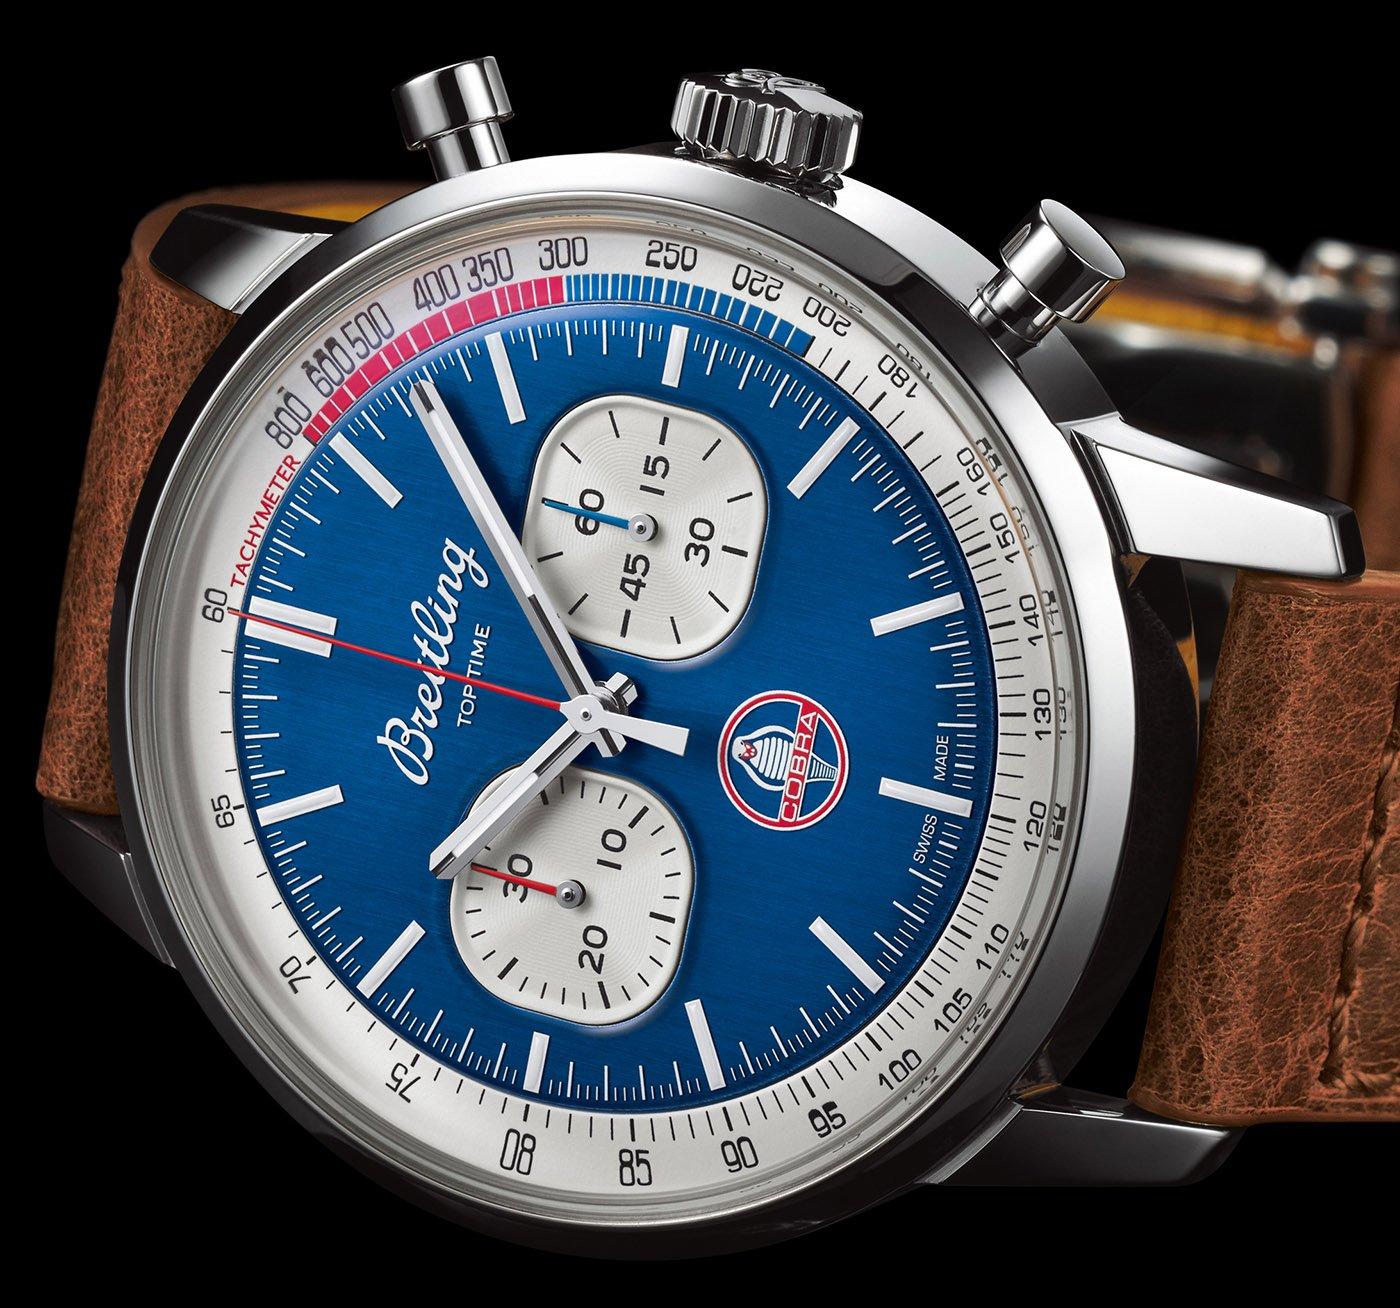 Breitling представляет коллекцию часов Top Time Classic Cars